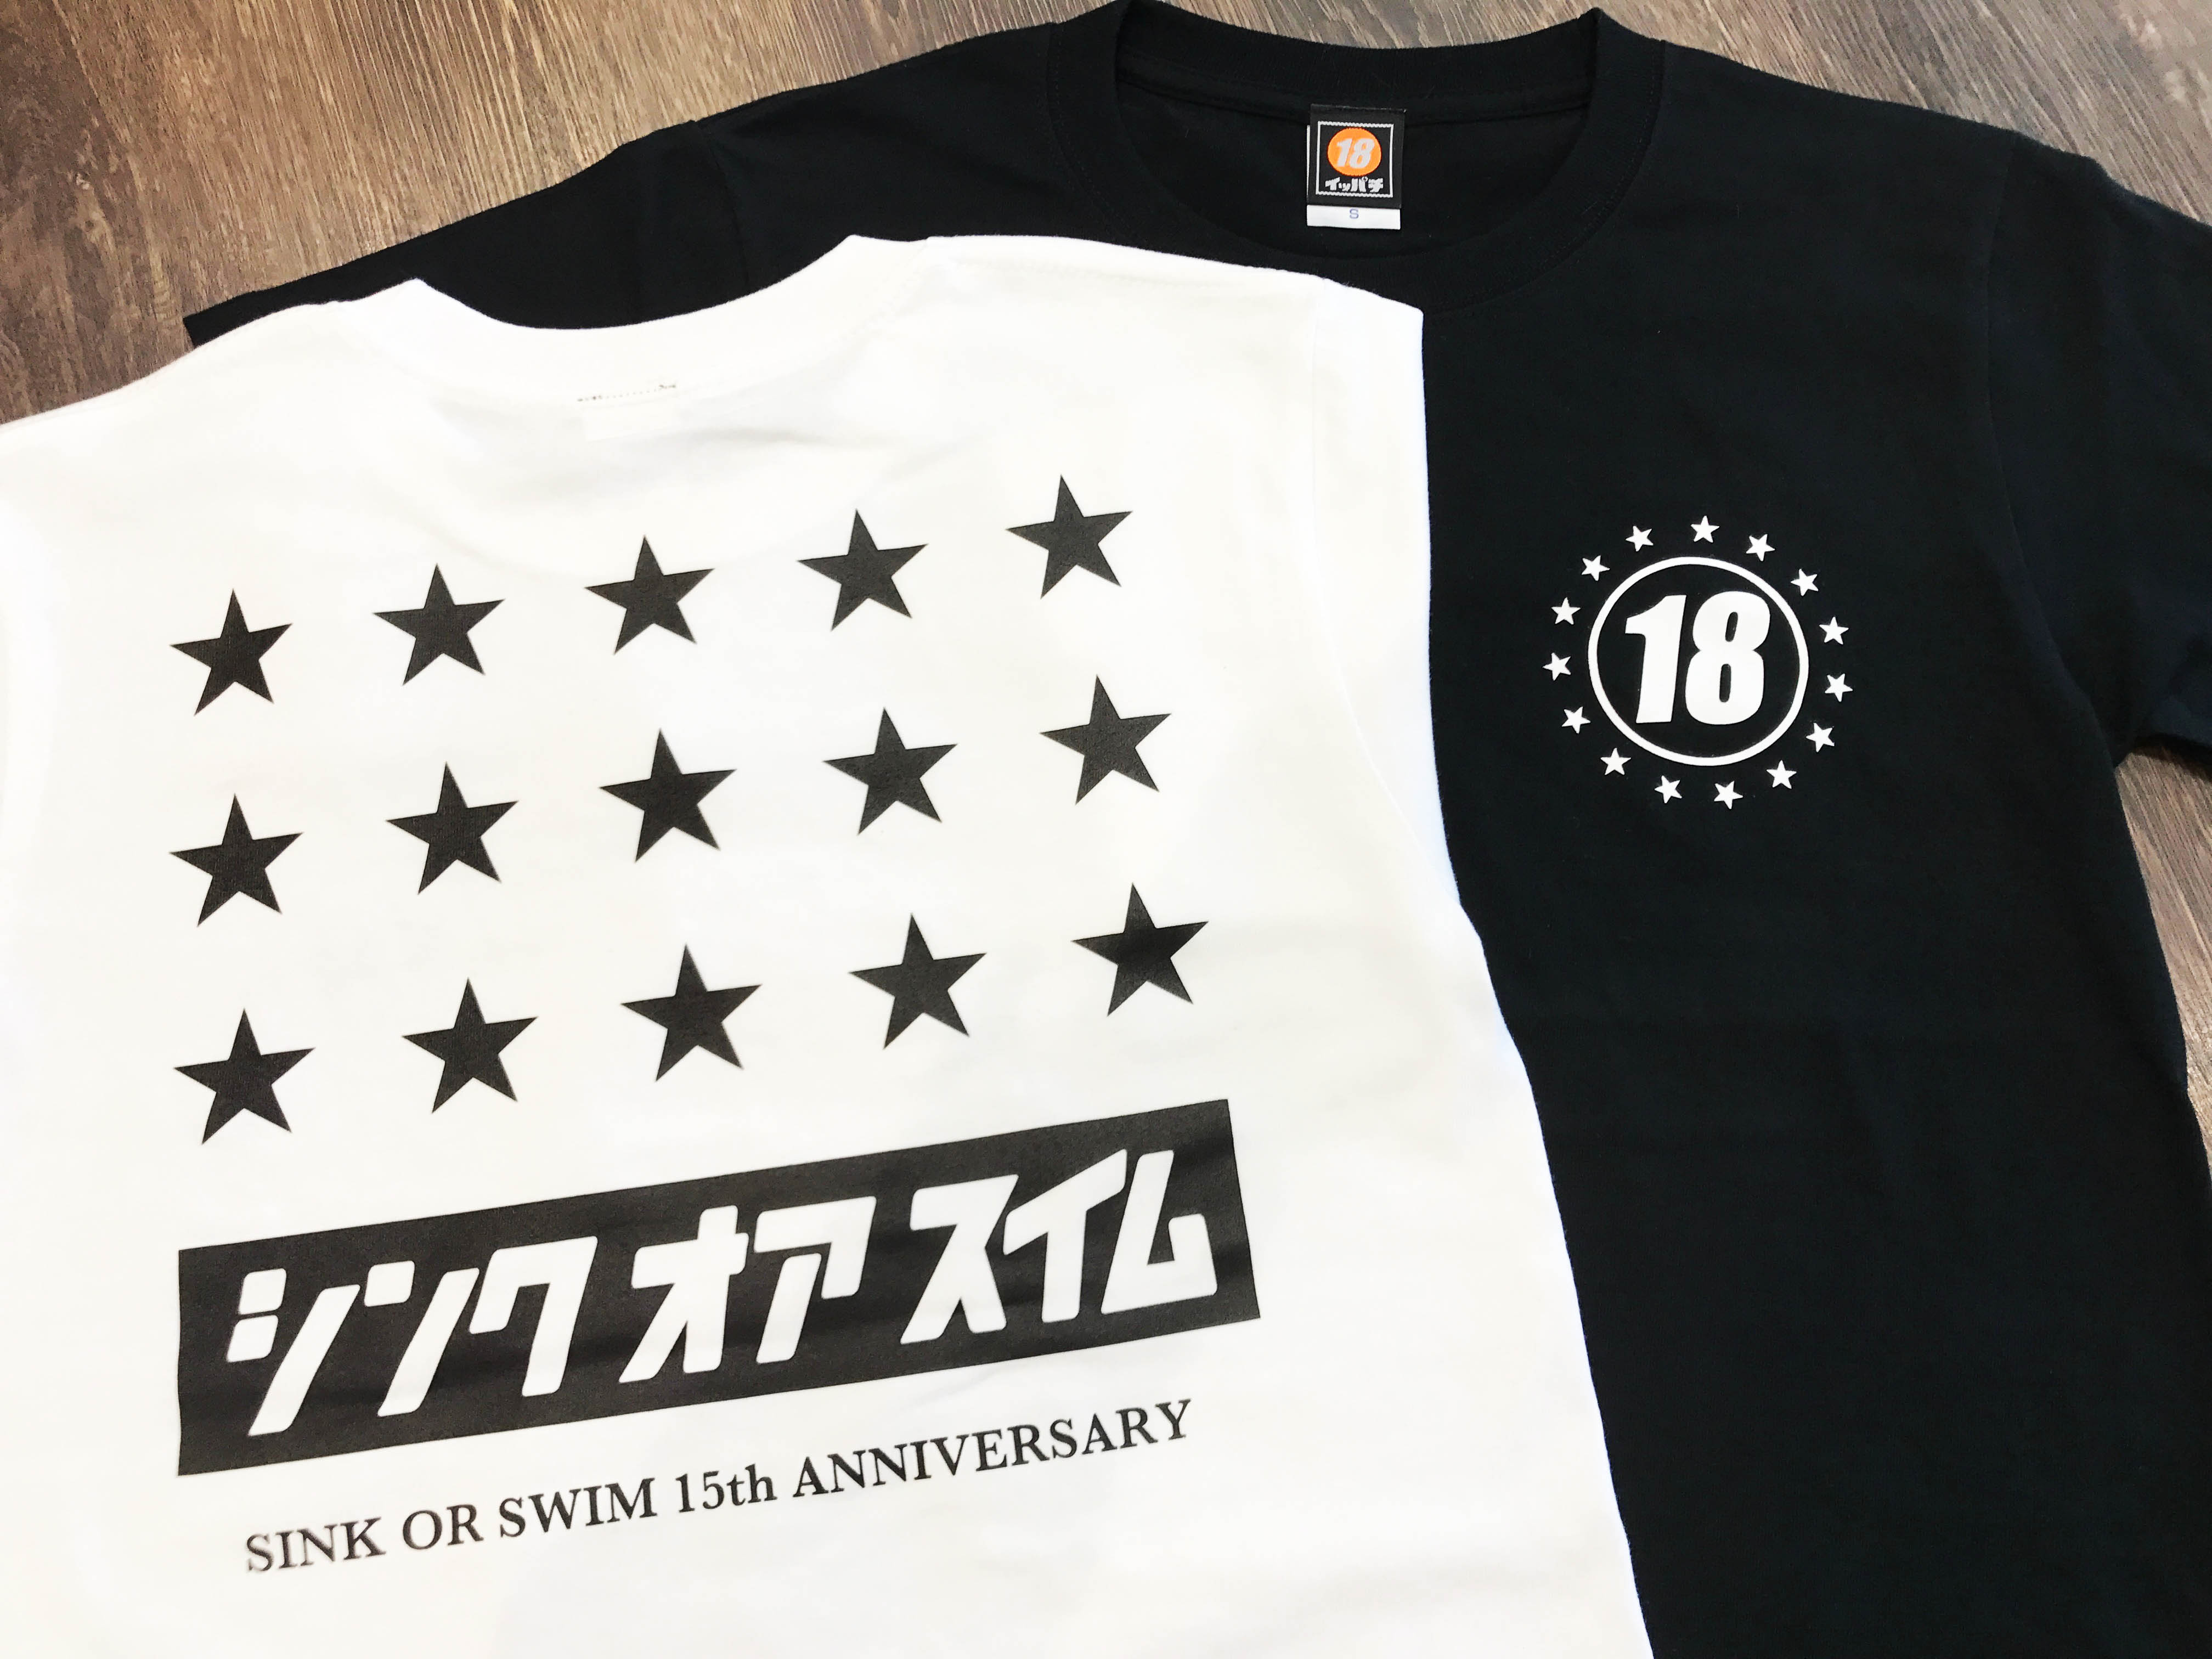 Sink Or Swim 15周年記念オリジナルTシャツ&パーカー製作